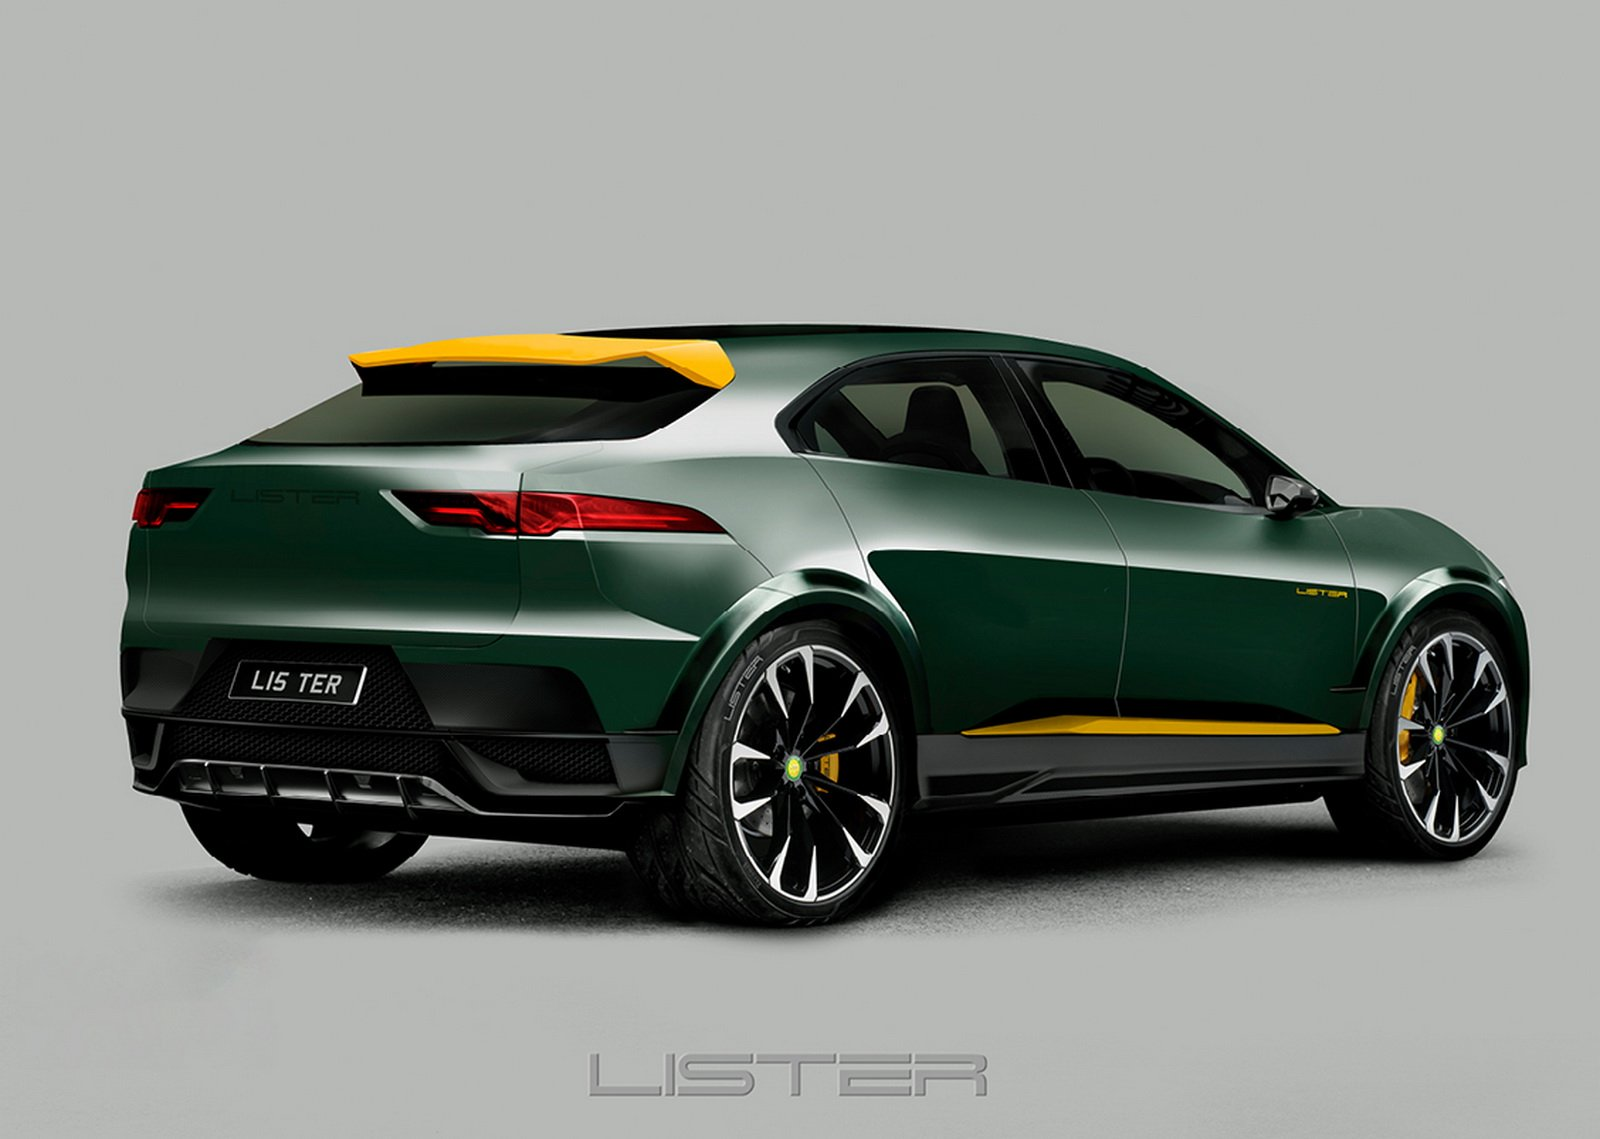 Lister Suv E Jaguar Ipace (2)